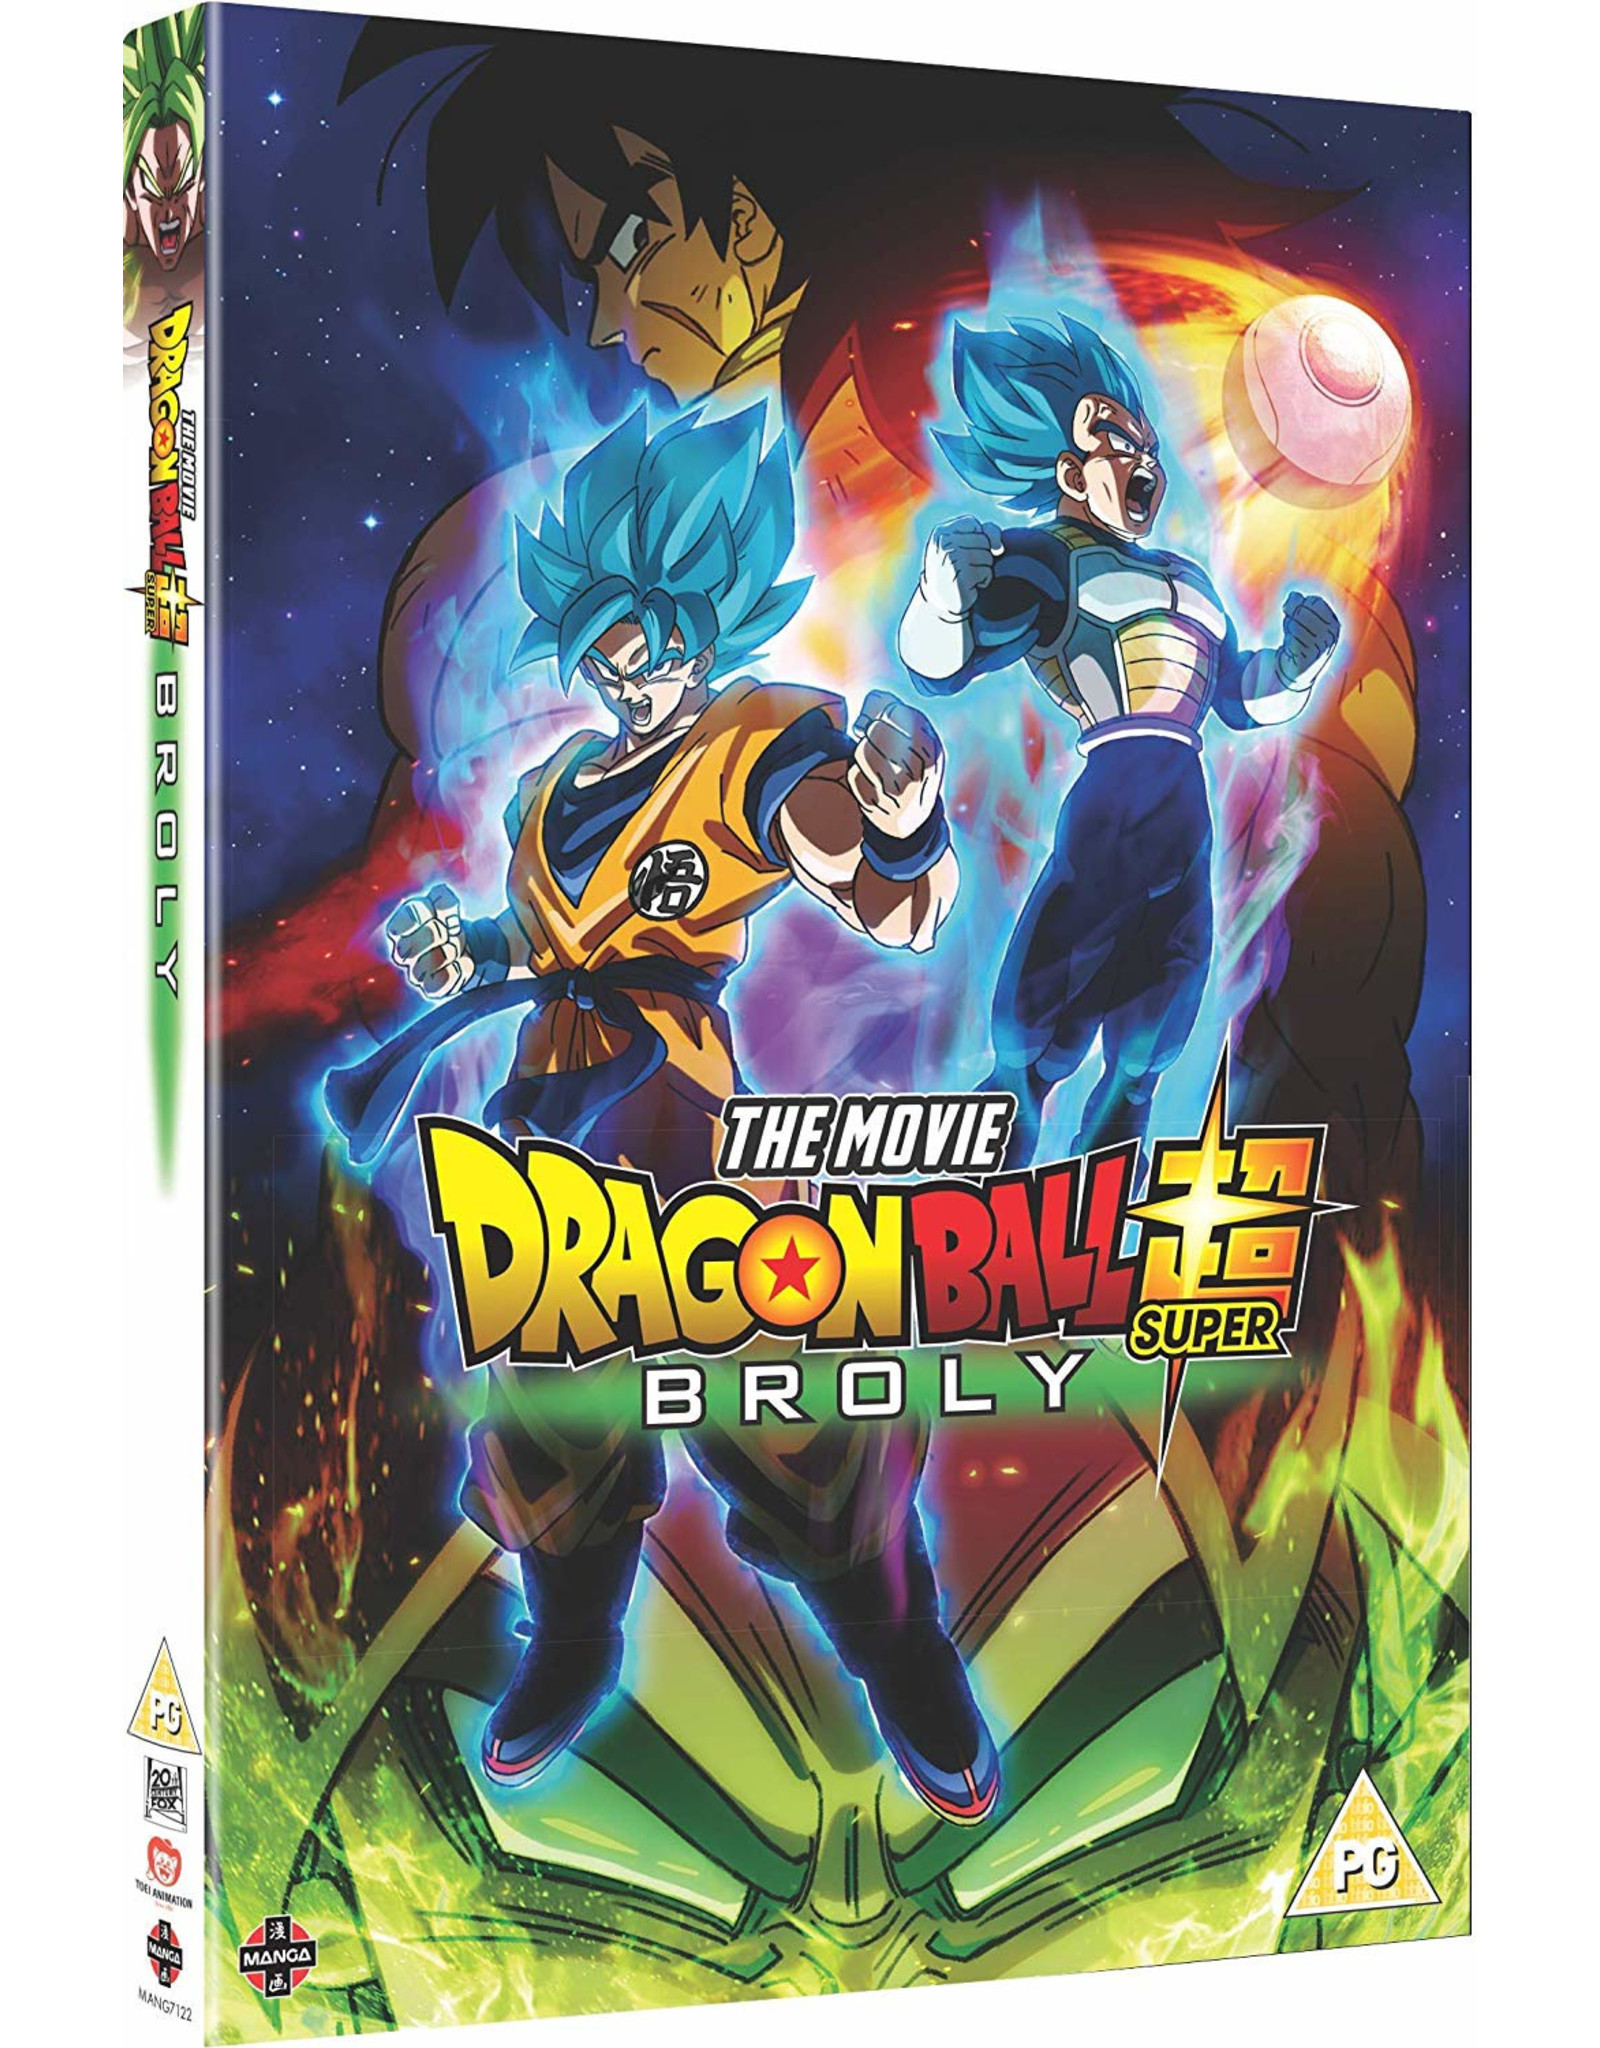 Dragon Ball Super:  Broly (DVD) - (Engelstalige ondertitels)